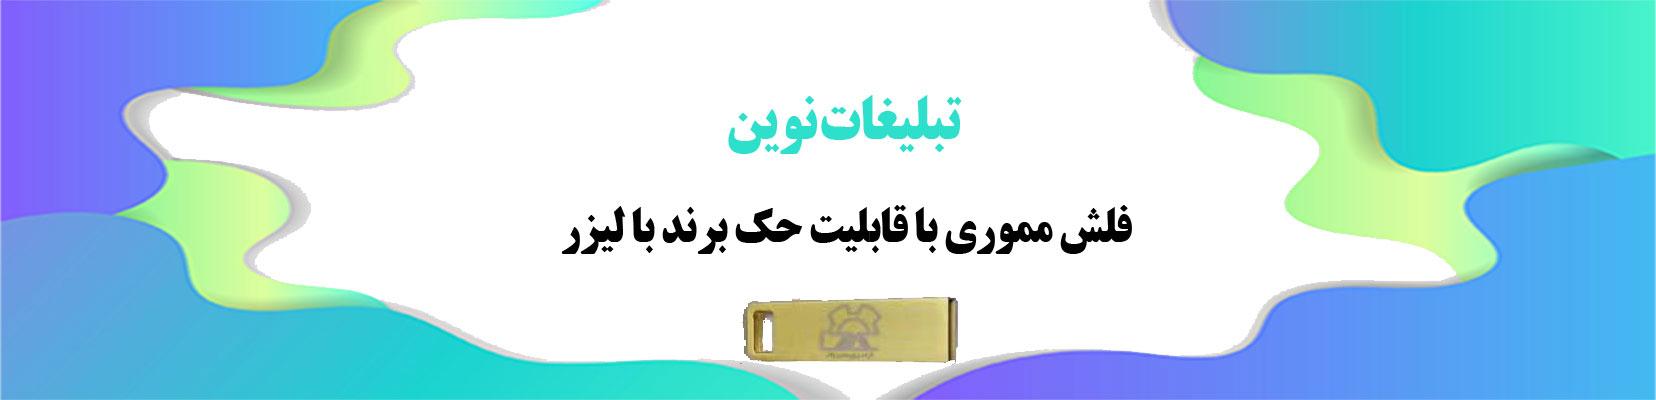 banner-tablighat